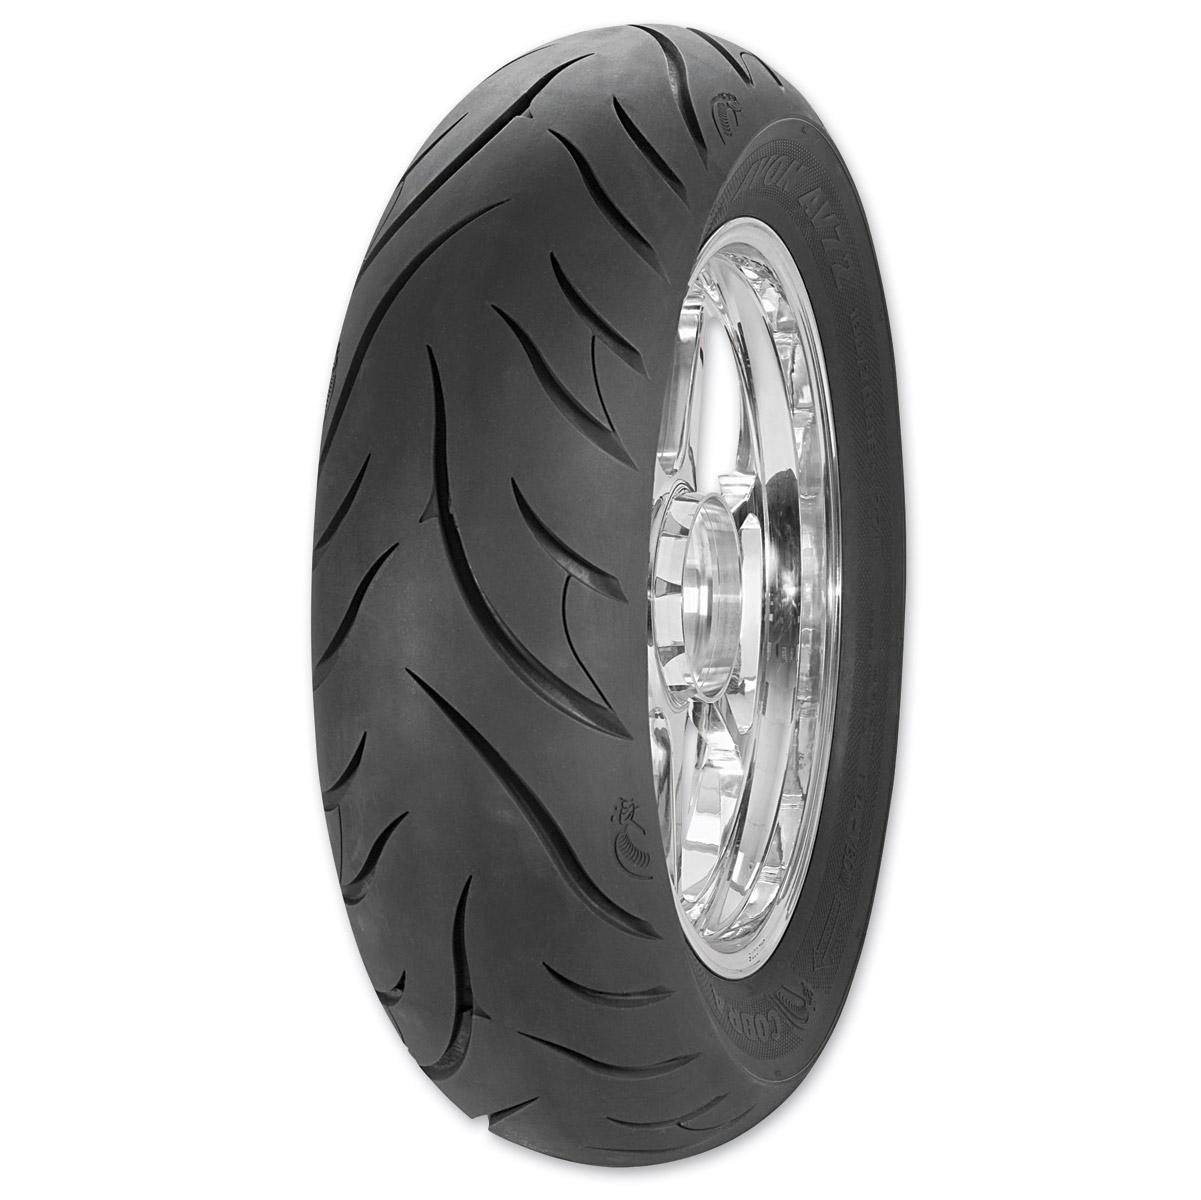 Motorcycle Rear Tire >> Avon Av72 Cobra 180 55zr18 Rear Tire 210 210 J P Cycles